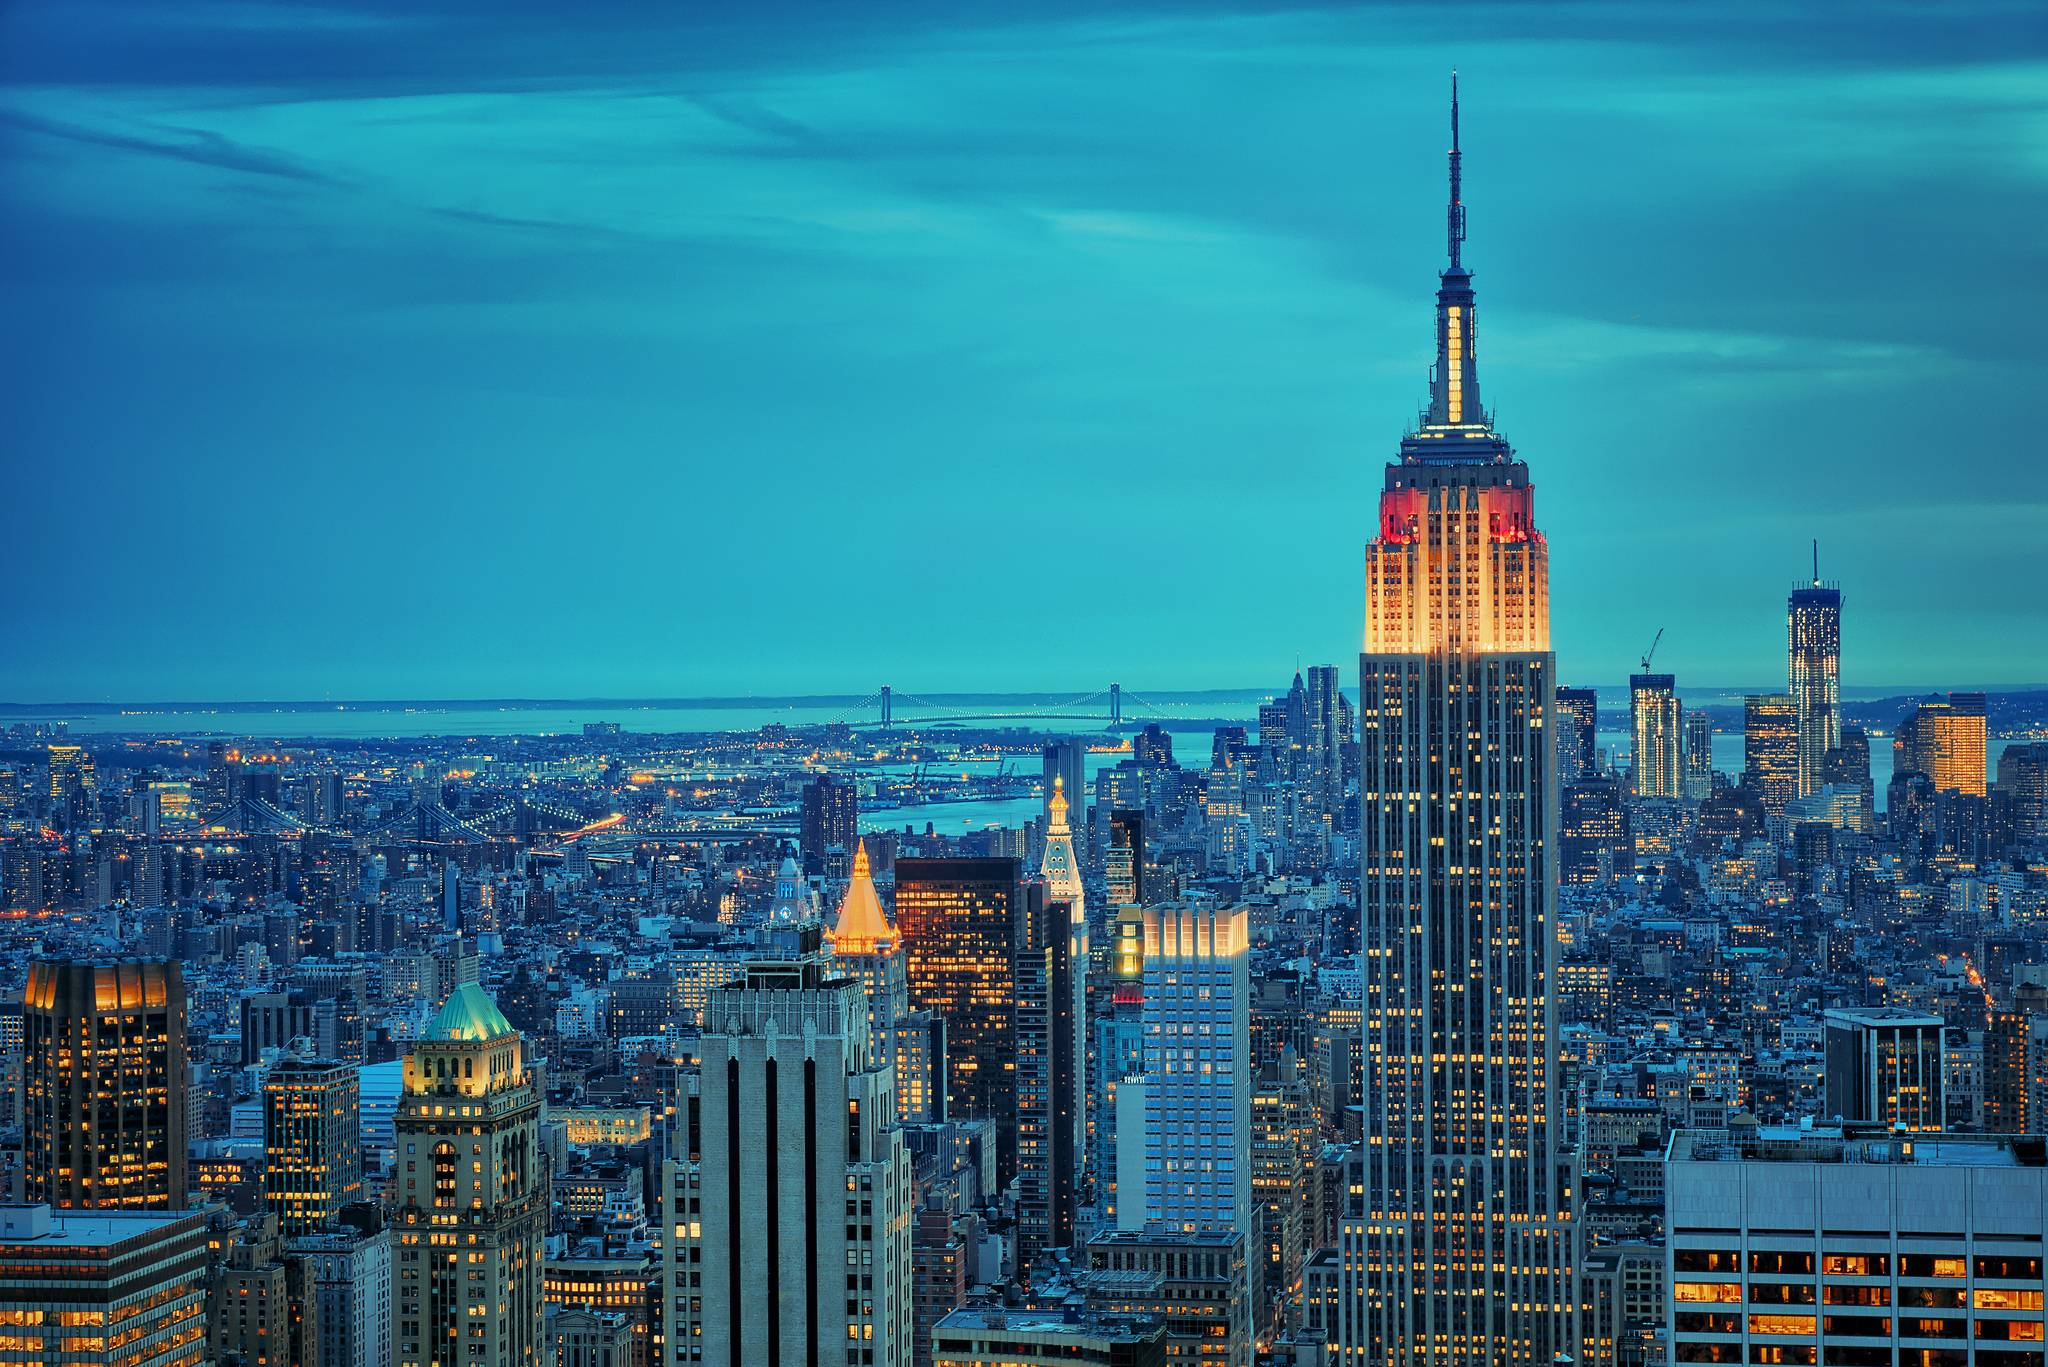 Wallpapers New York City 2048x1367